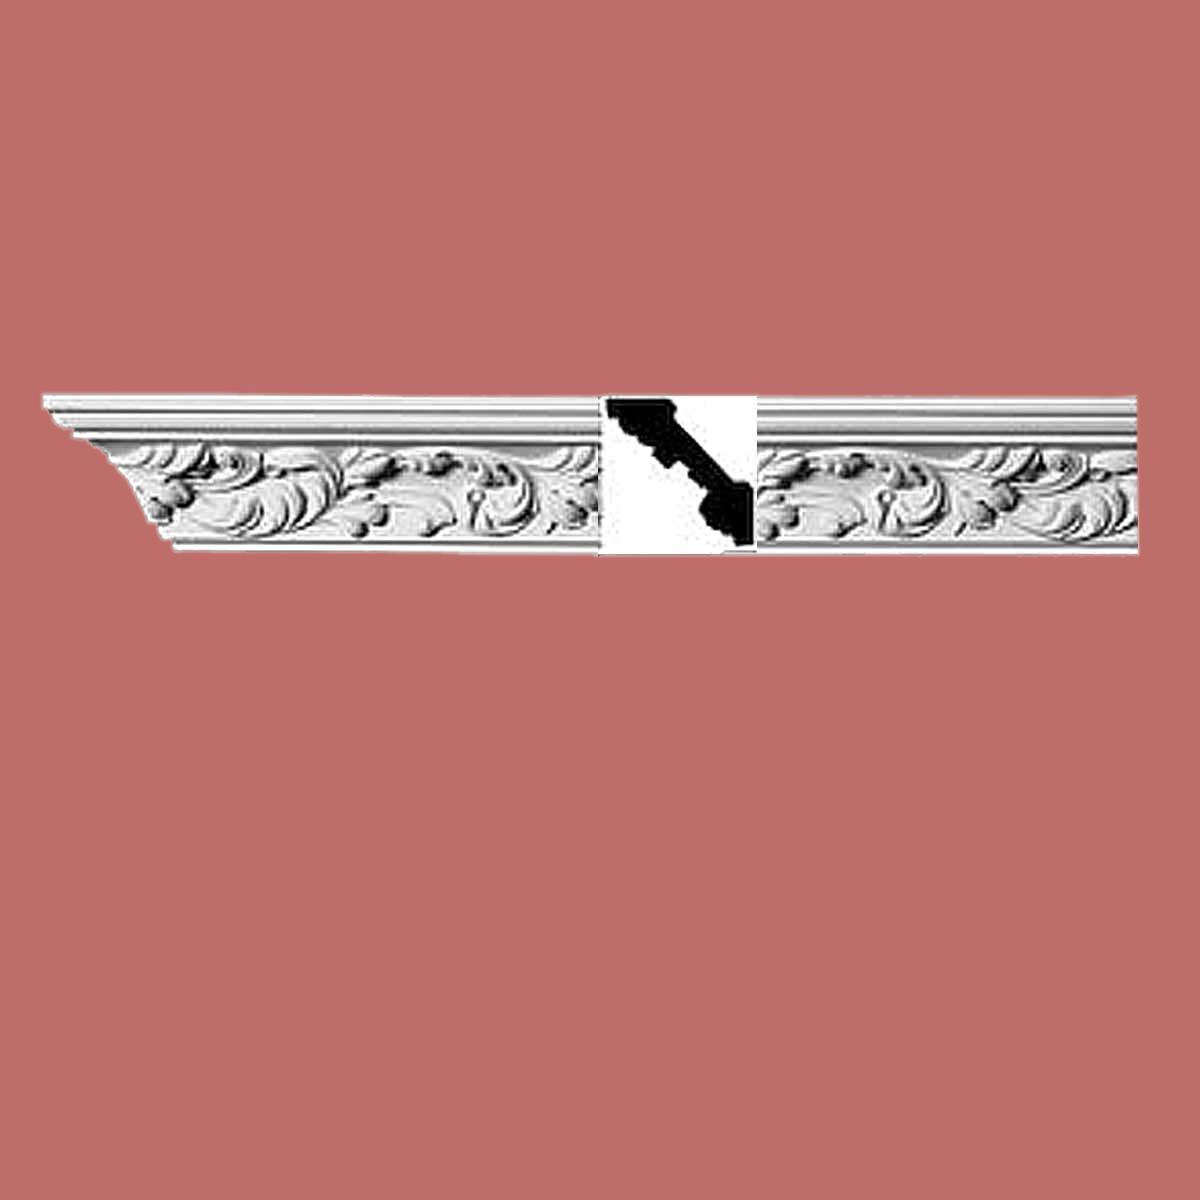 Cornice White Urethane Sample of 10997 23.5 Long Cornice Cornice Moulding Cornice Molding